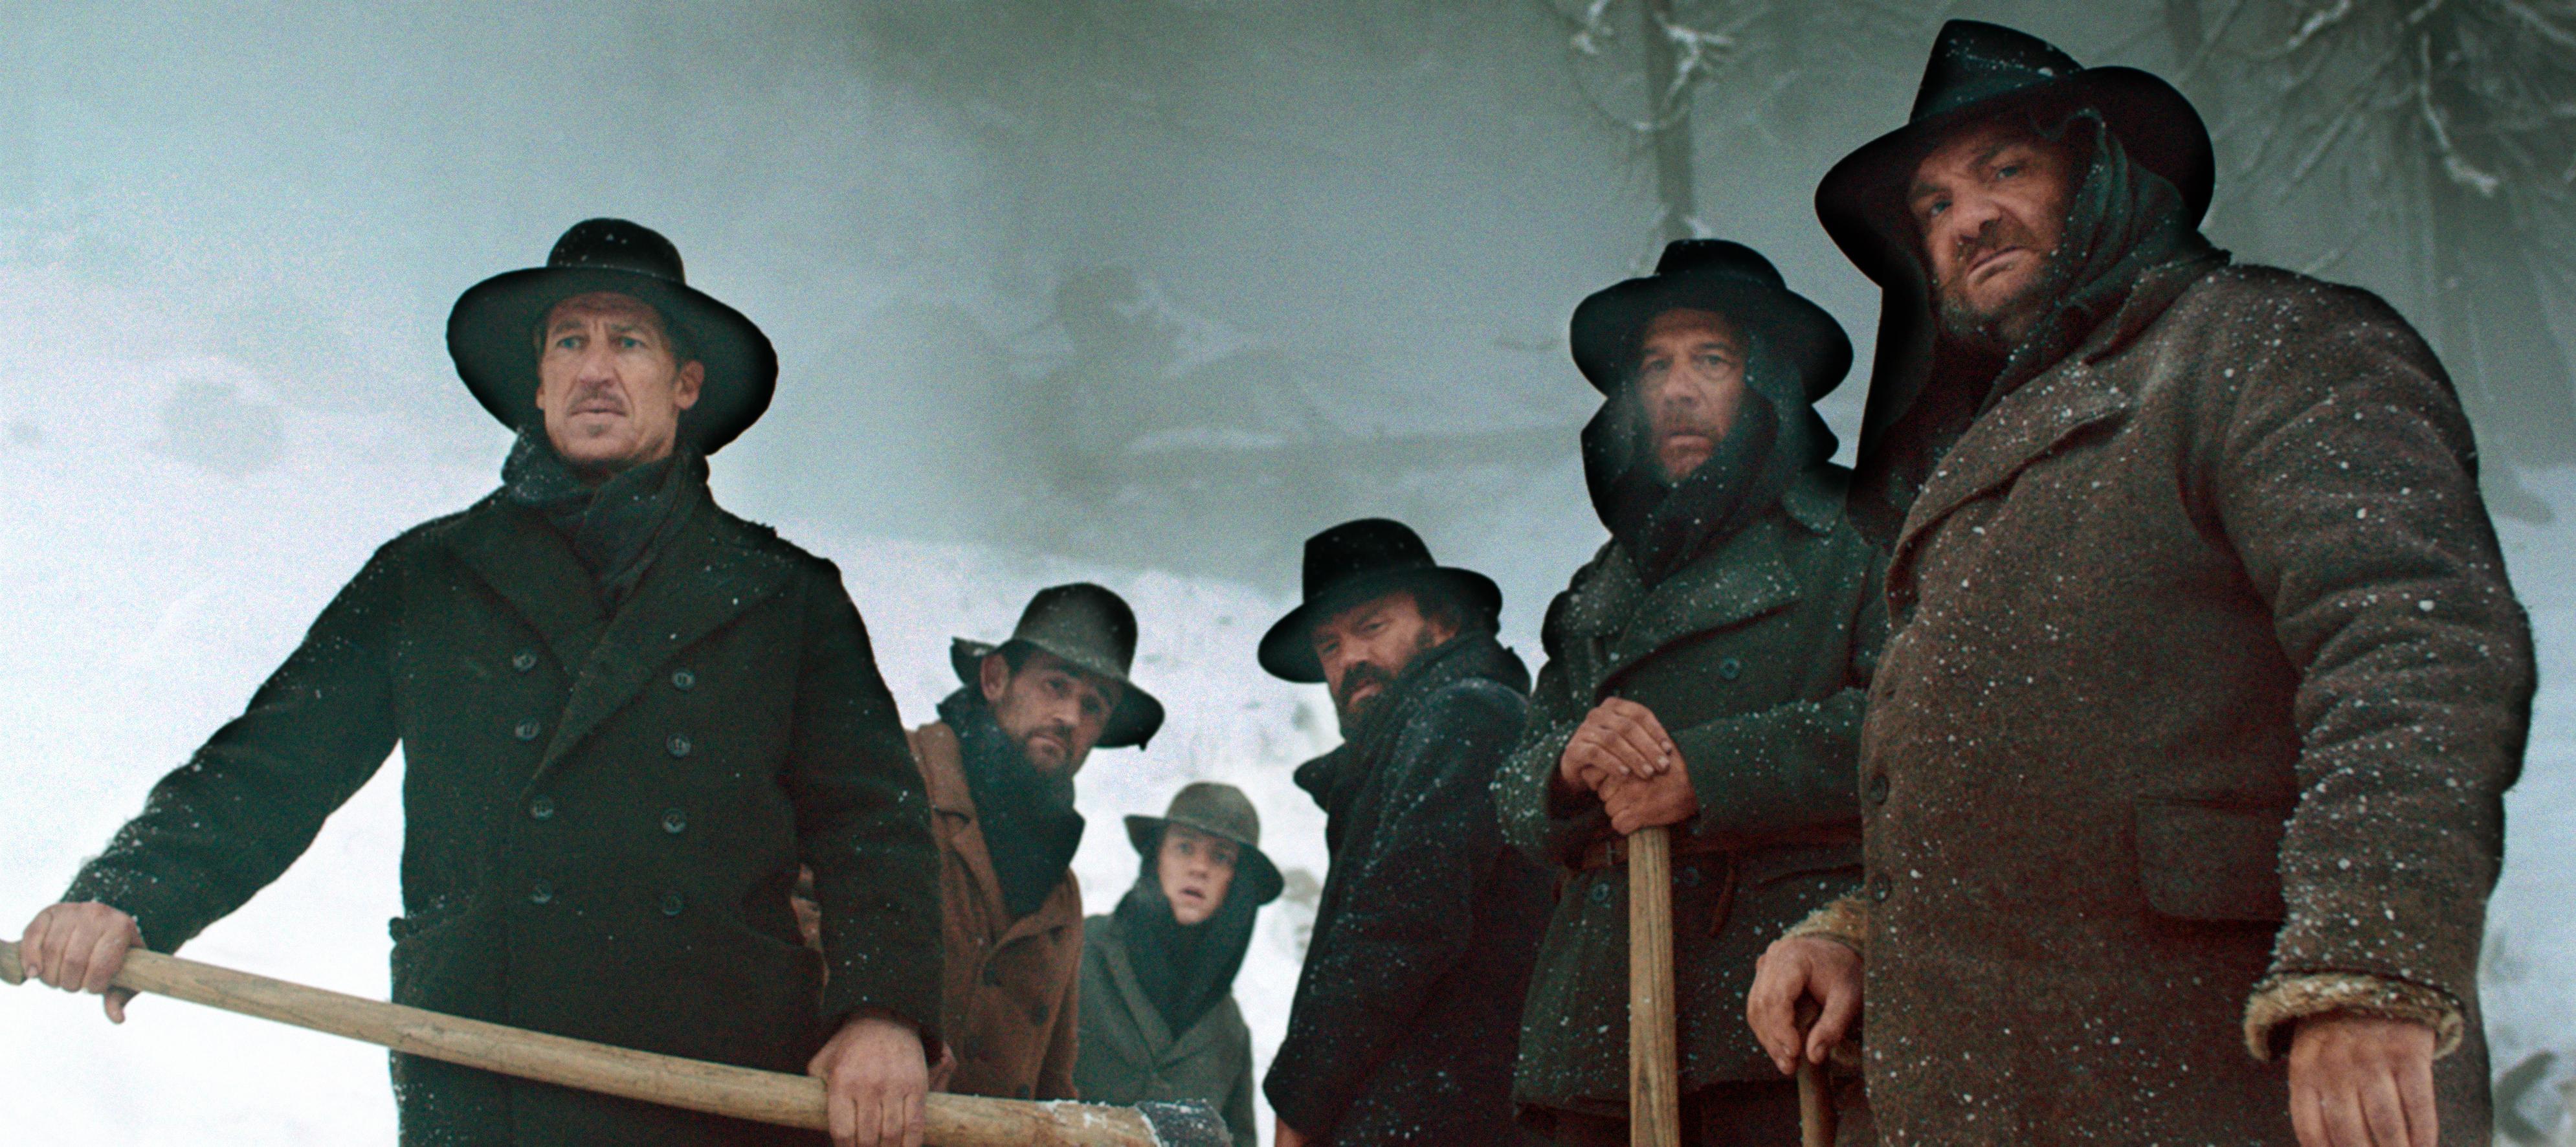 Tobias Moretti, Johannes Nikolussi, Clemens Schick, Martin Leutgeb, Florian Brückner, and Helmuth Häusler in Das finstere Tal (2014)